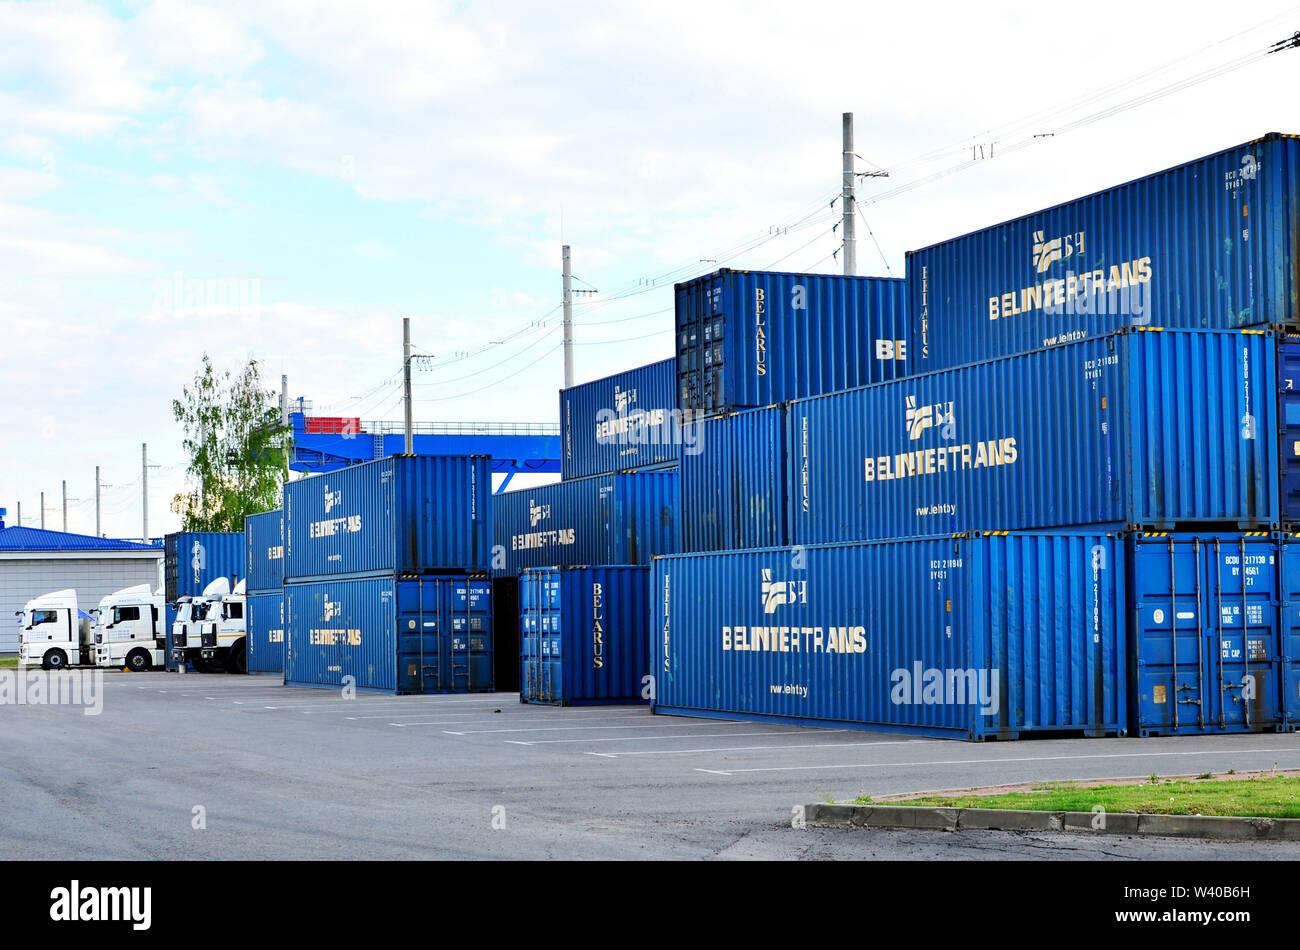 Minsk, Belarus - May 13, 2019: Transport-Logistics Centre BELINTERTRANS of the Belarusian Railway (BTLC State Enterprise). Cargo dock terminal with se - Stock Image